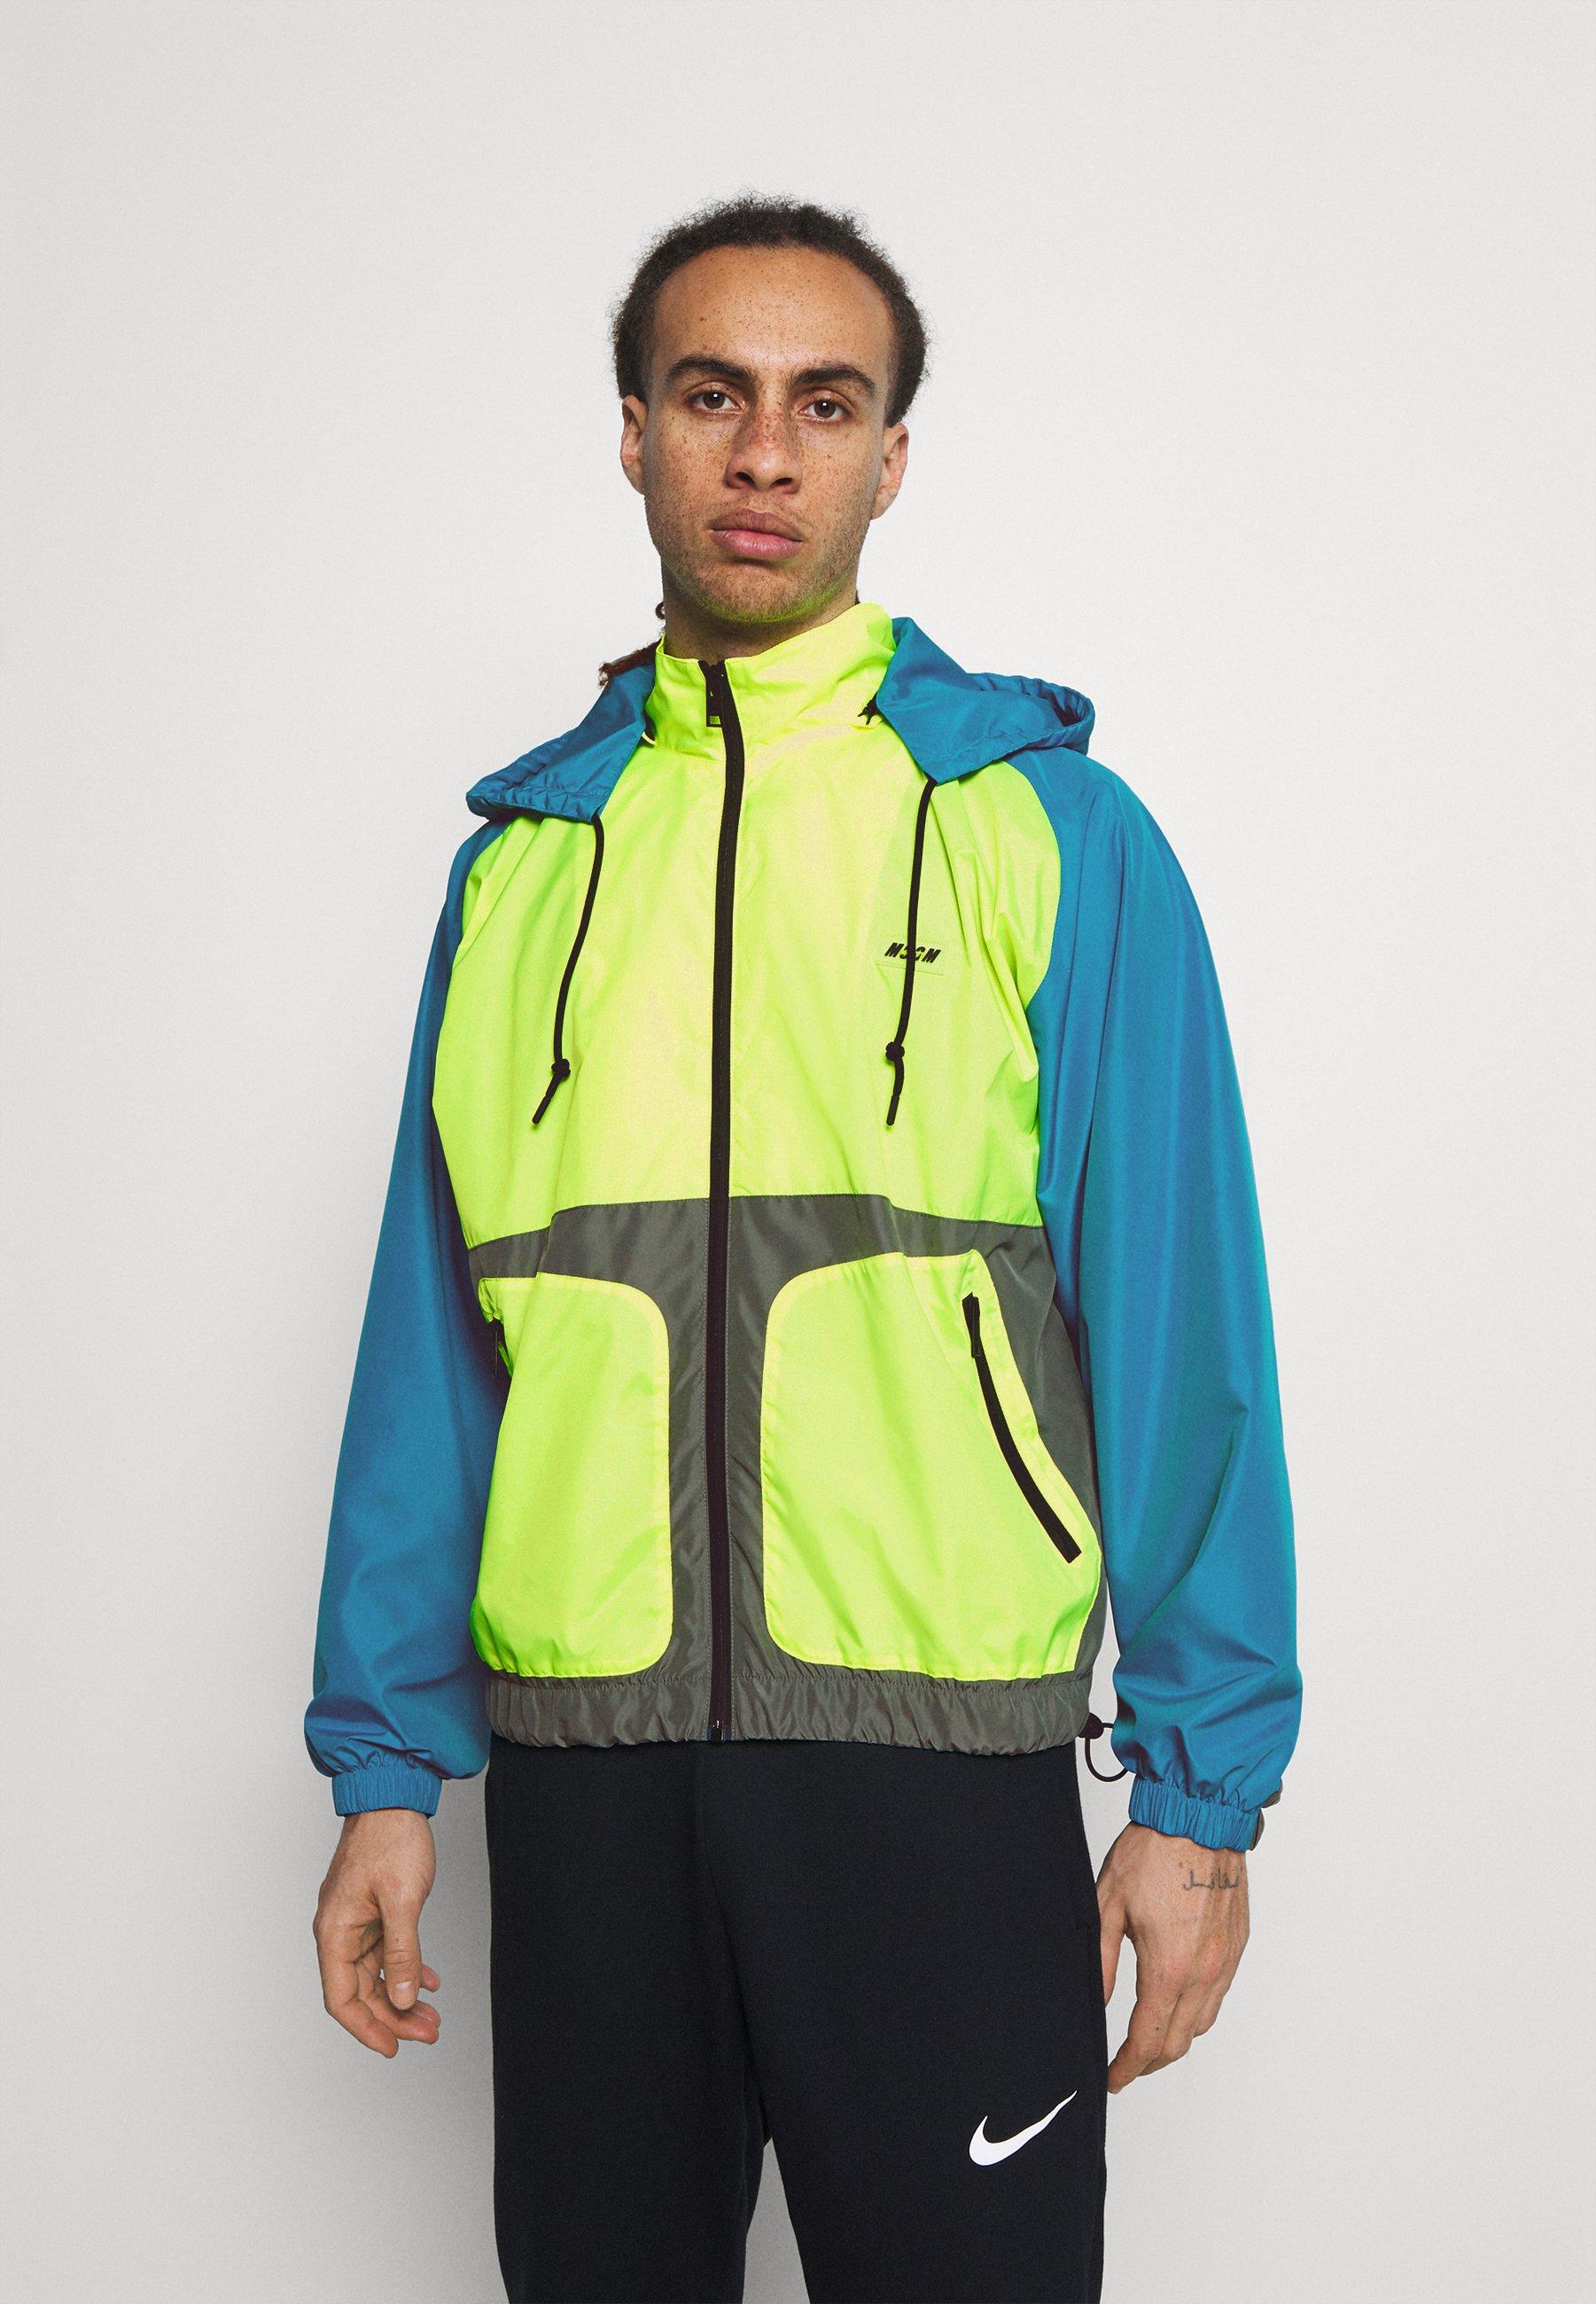 Men GIUBBINO JACKET - Training jacket